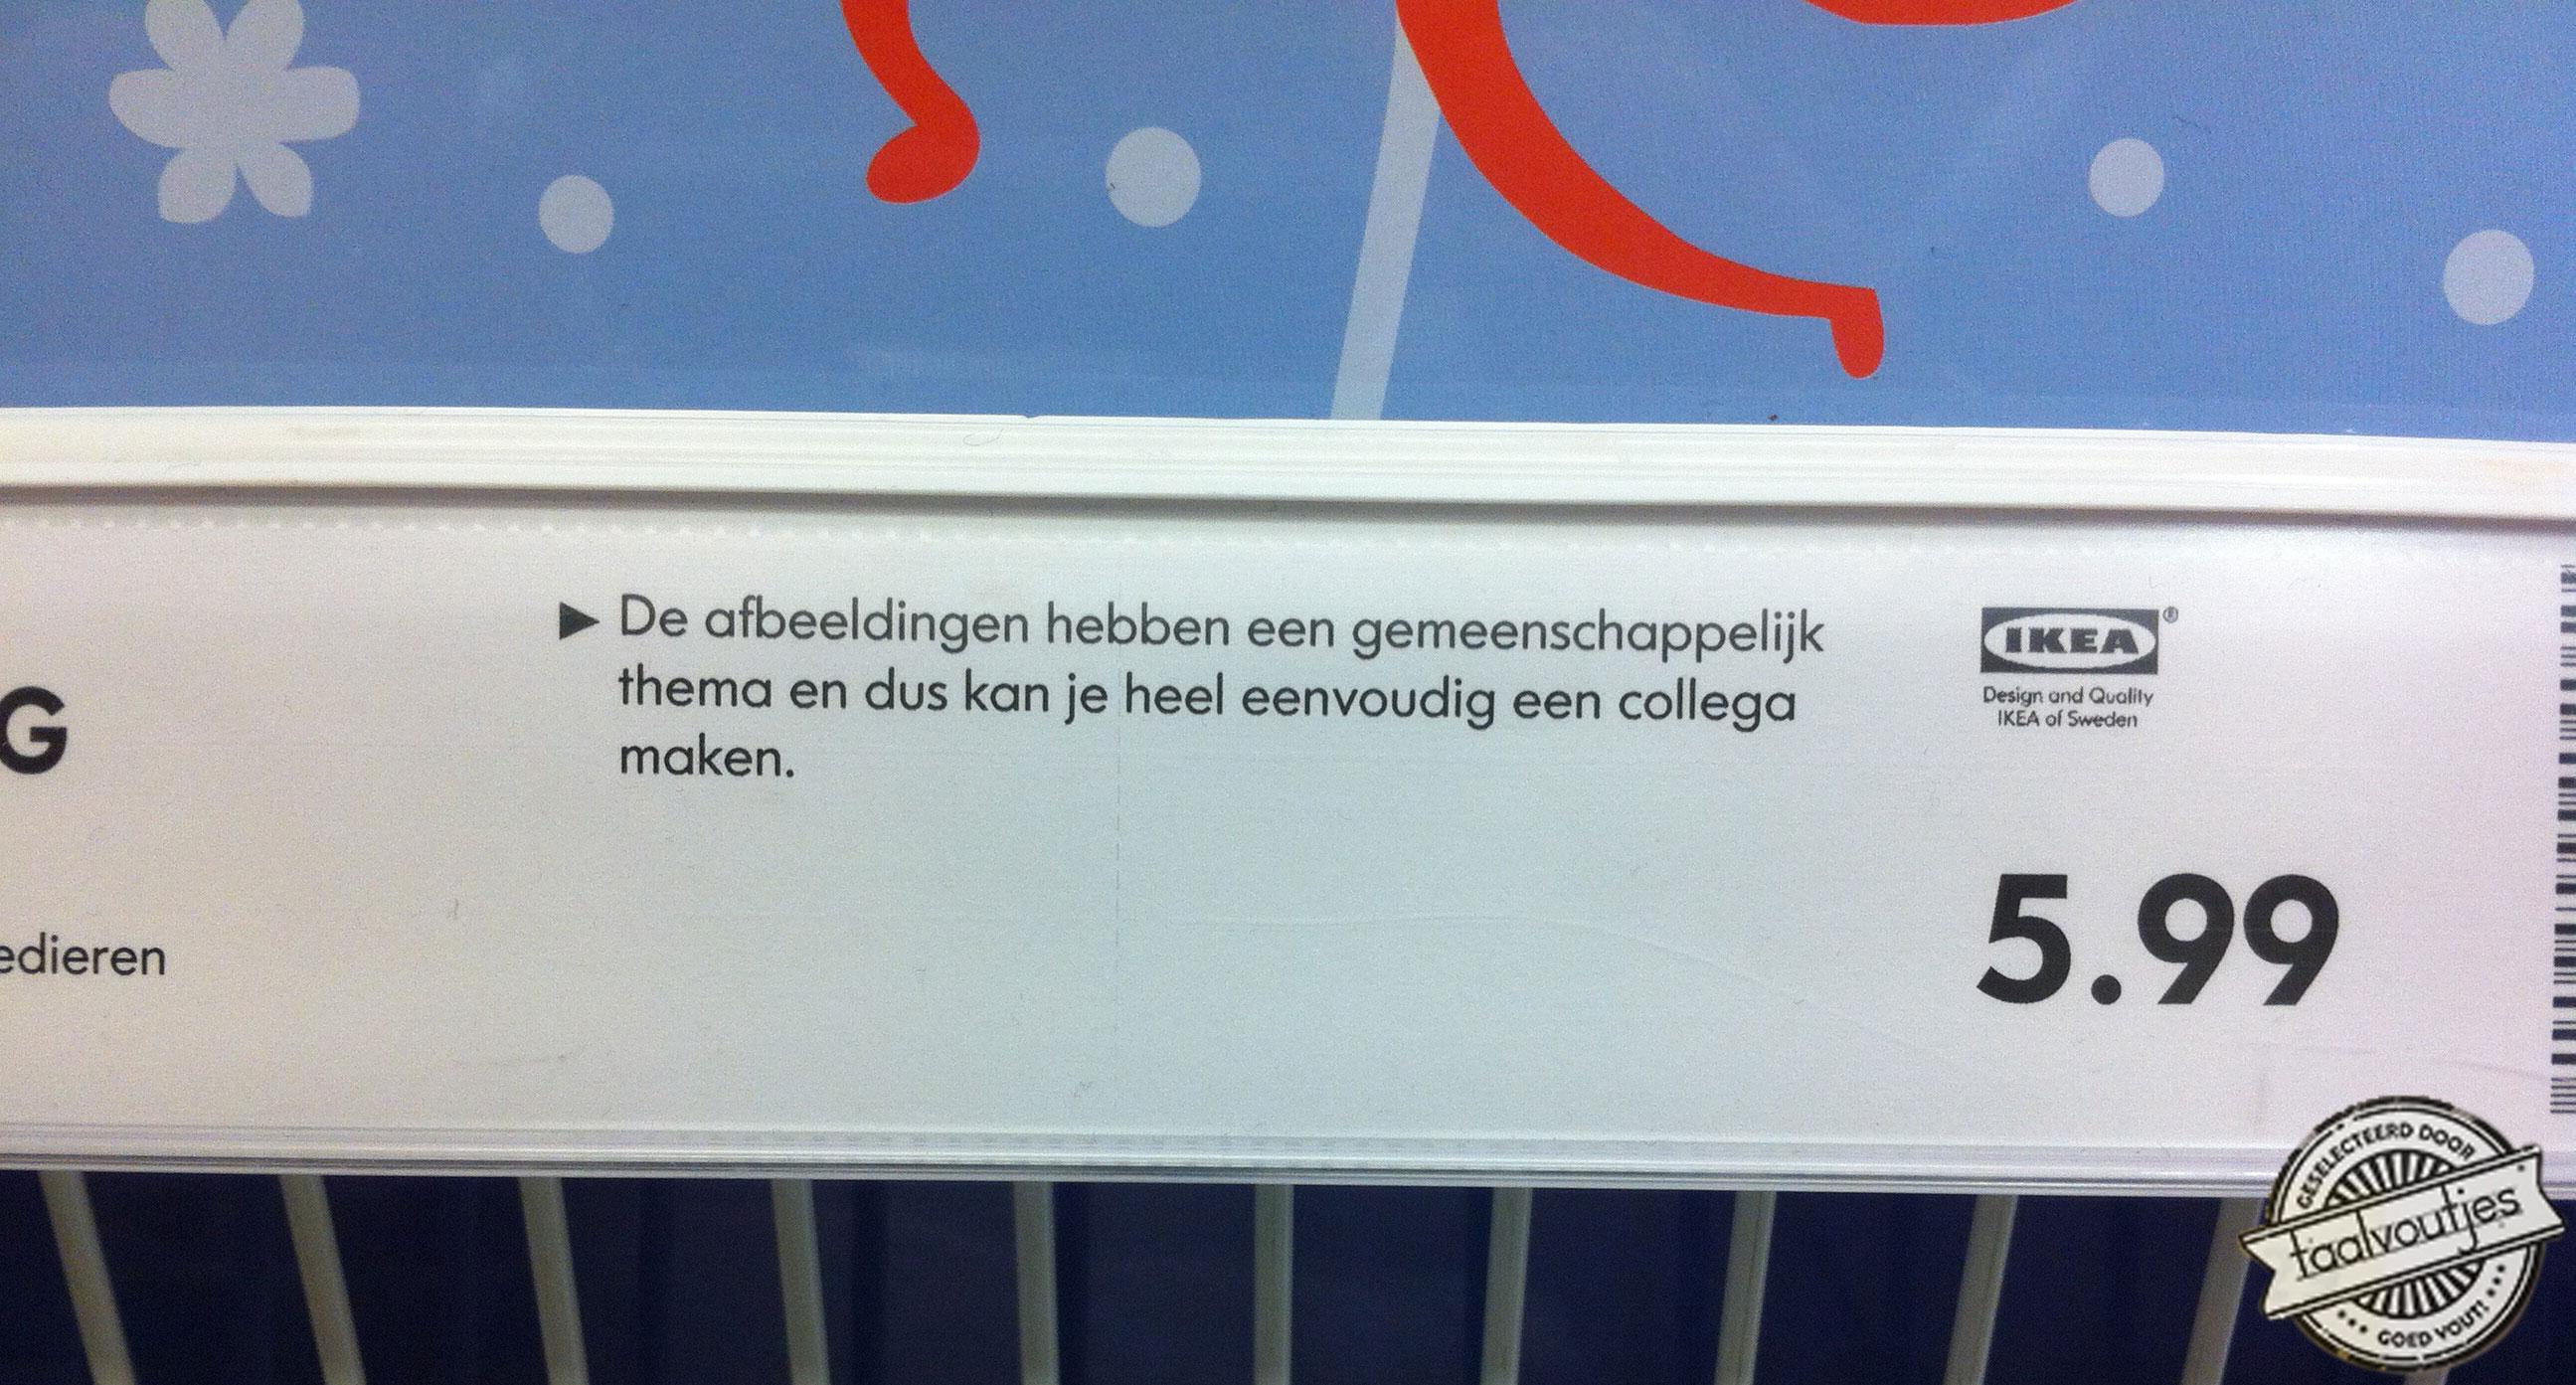 Collega maken - Ikea